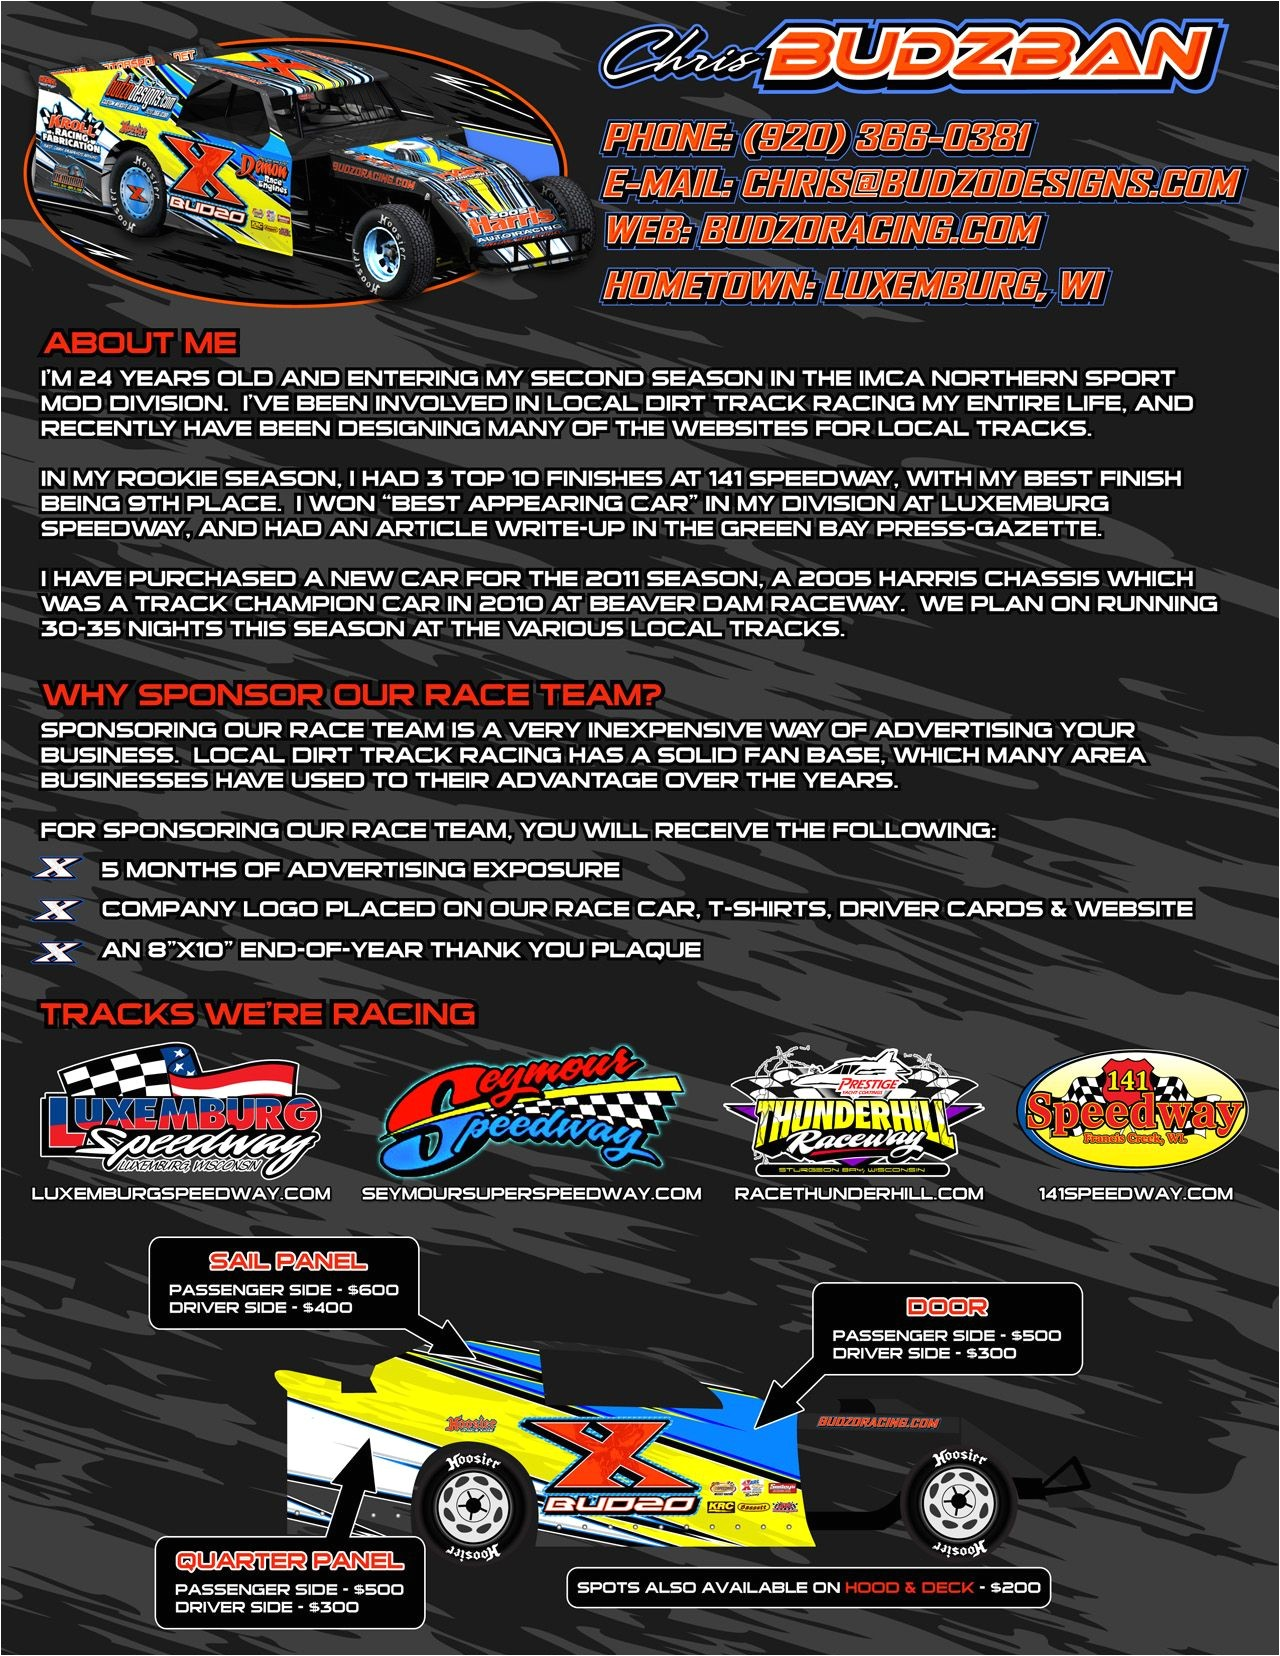 Dirt Track Racing Sponsorship Proposal Template Racing Sponsorship Proposal Google Search Peaches